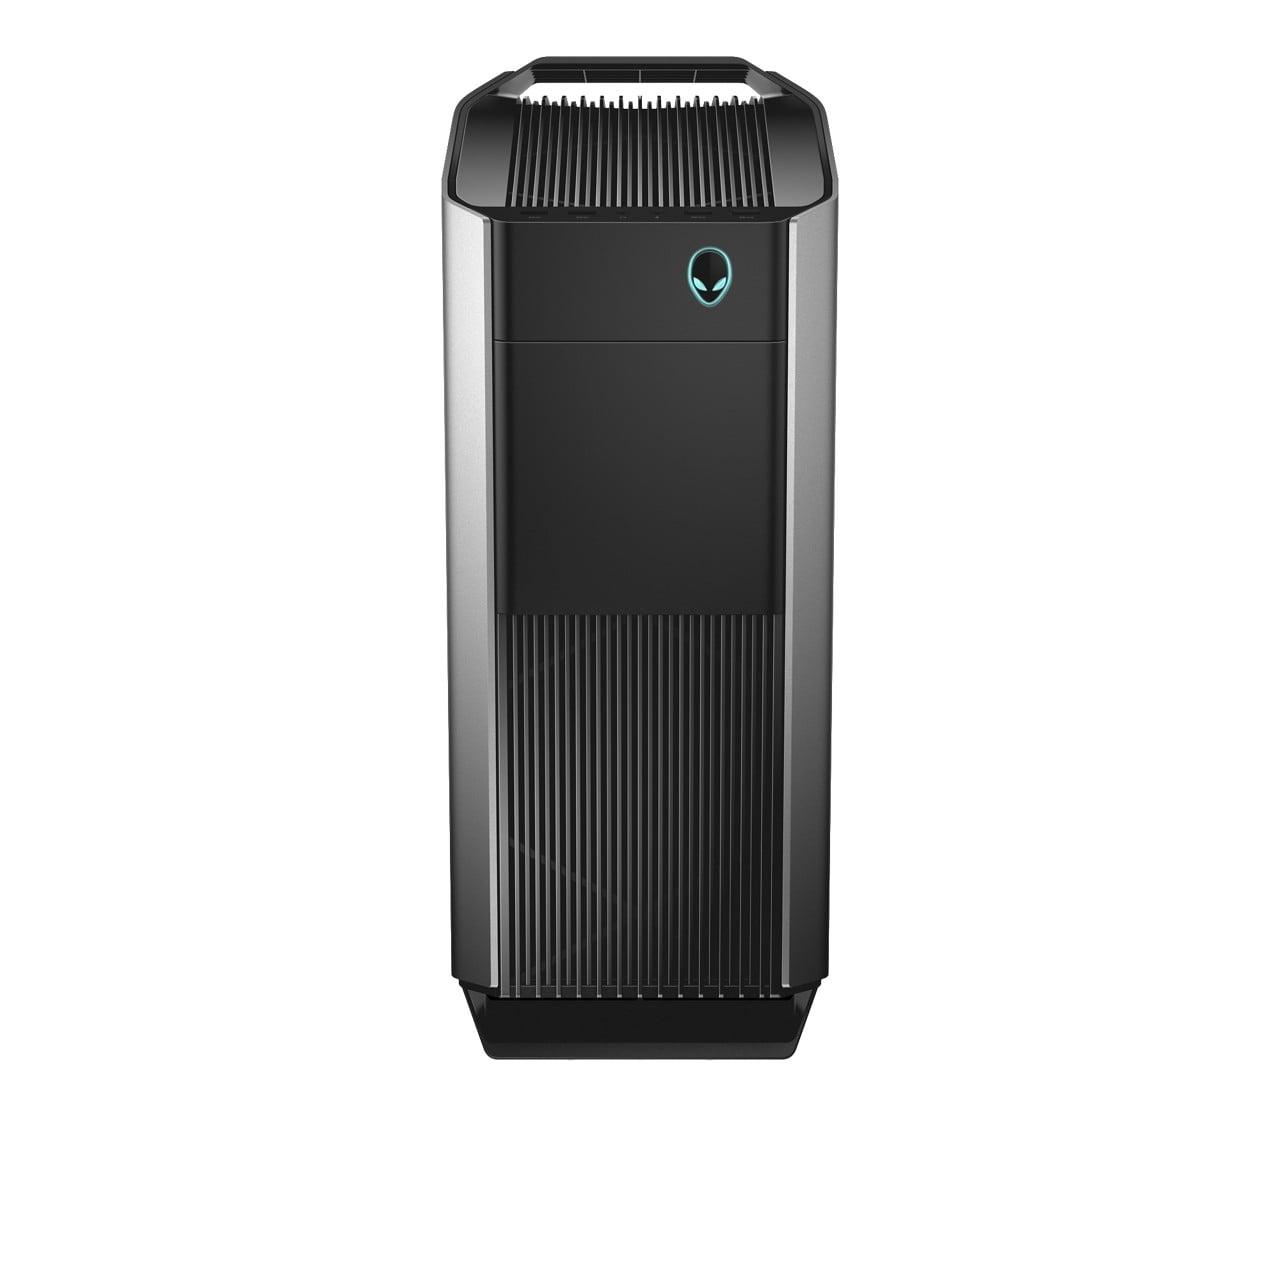 Dell Aurora R8 Intel Core i7-9700 X8 4.7GHz 16GB 1TB SSD Win10, Black/Gray (Certified Refurbished)